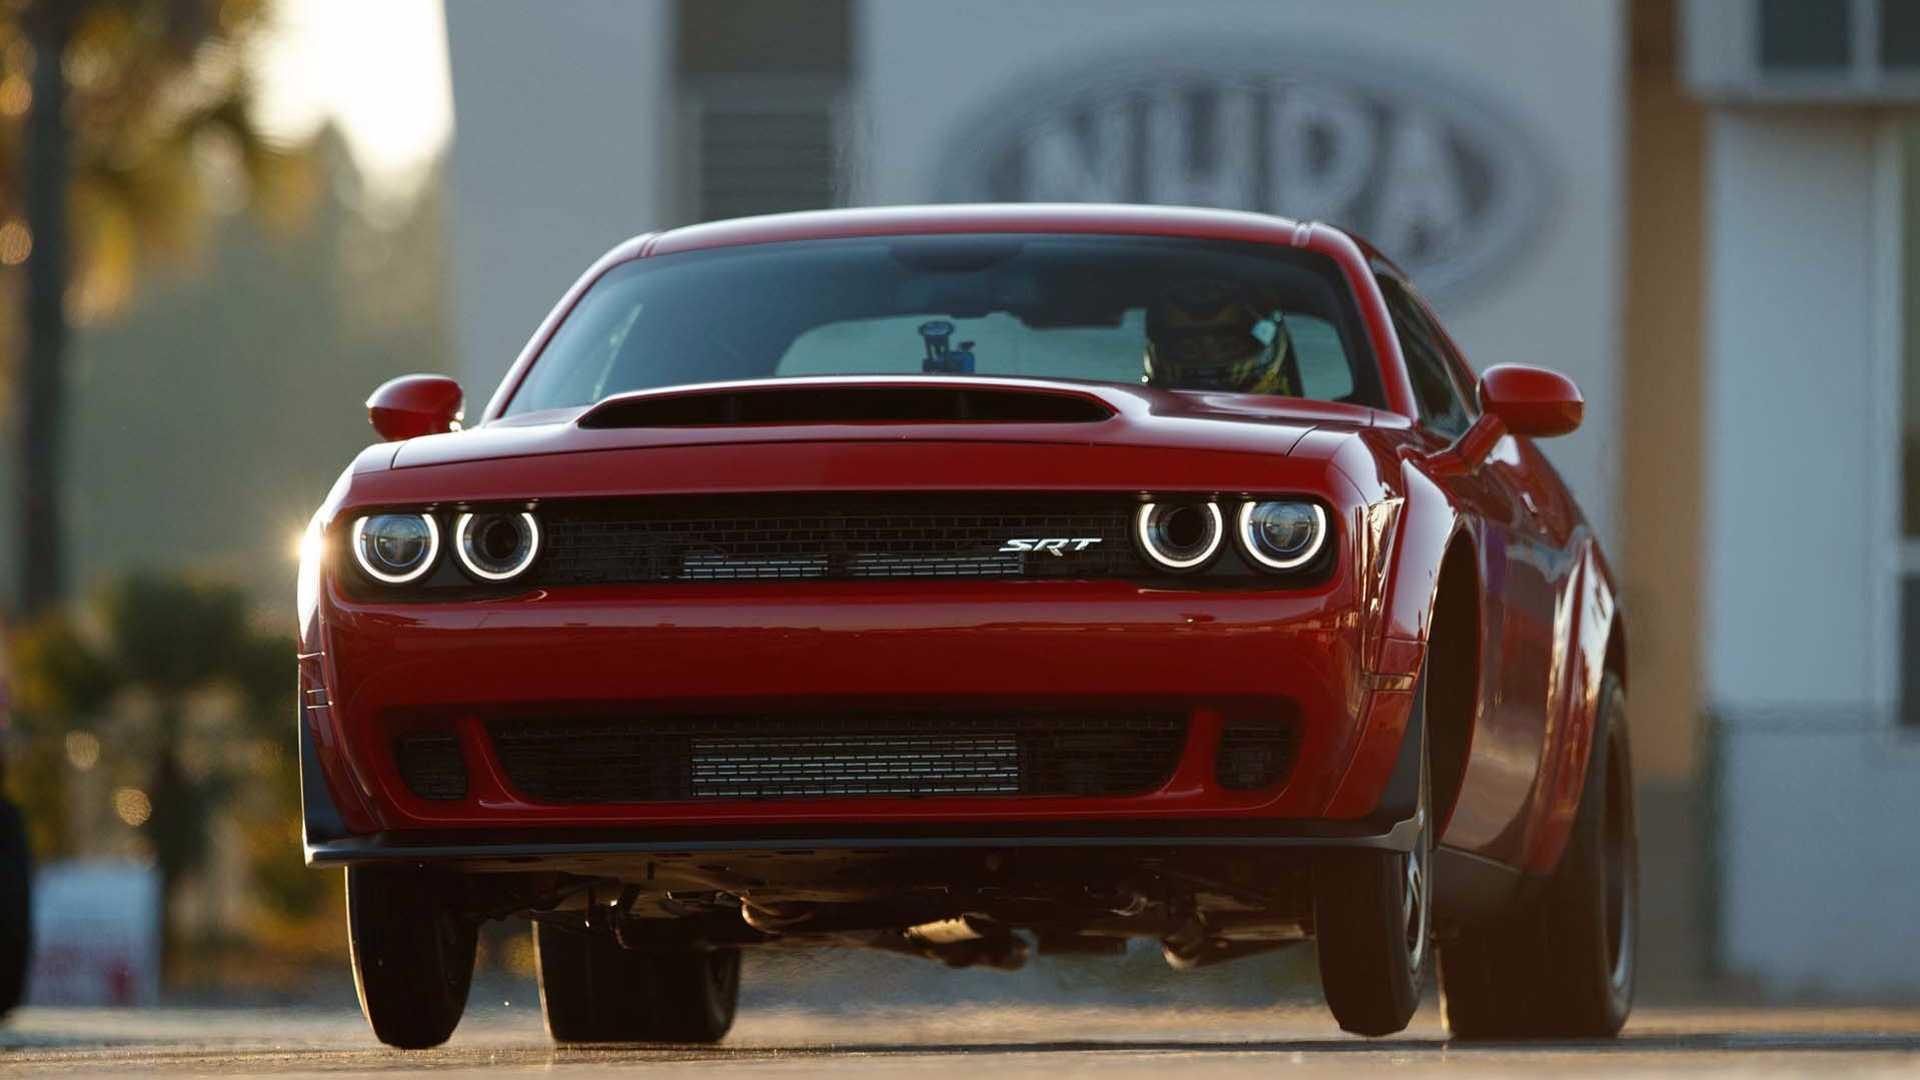 Dodge Challenger Demon Priced At 85k Demon Crate Is 1 Option